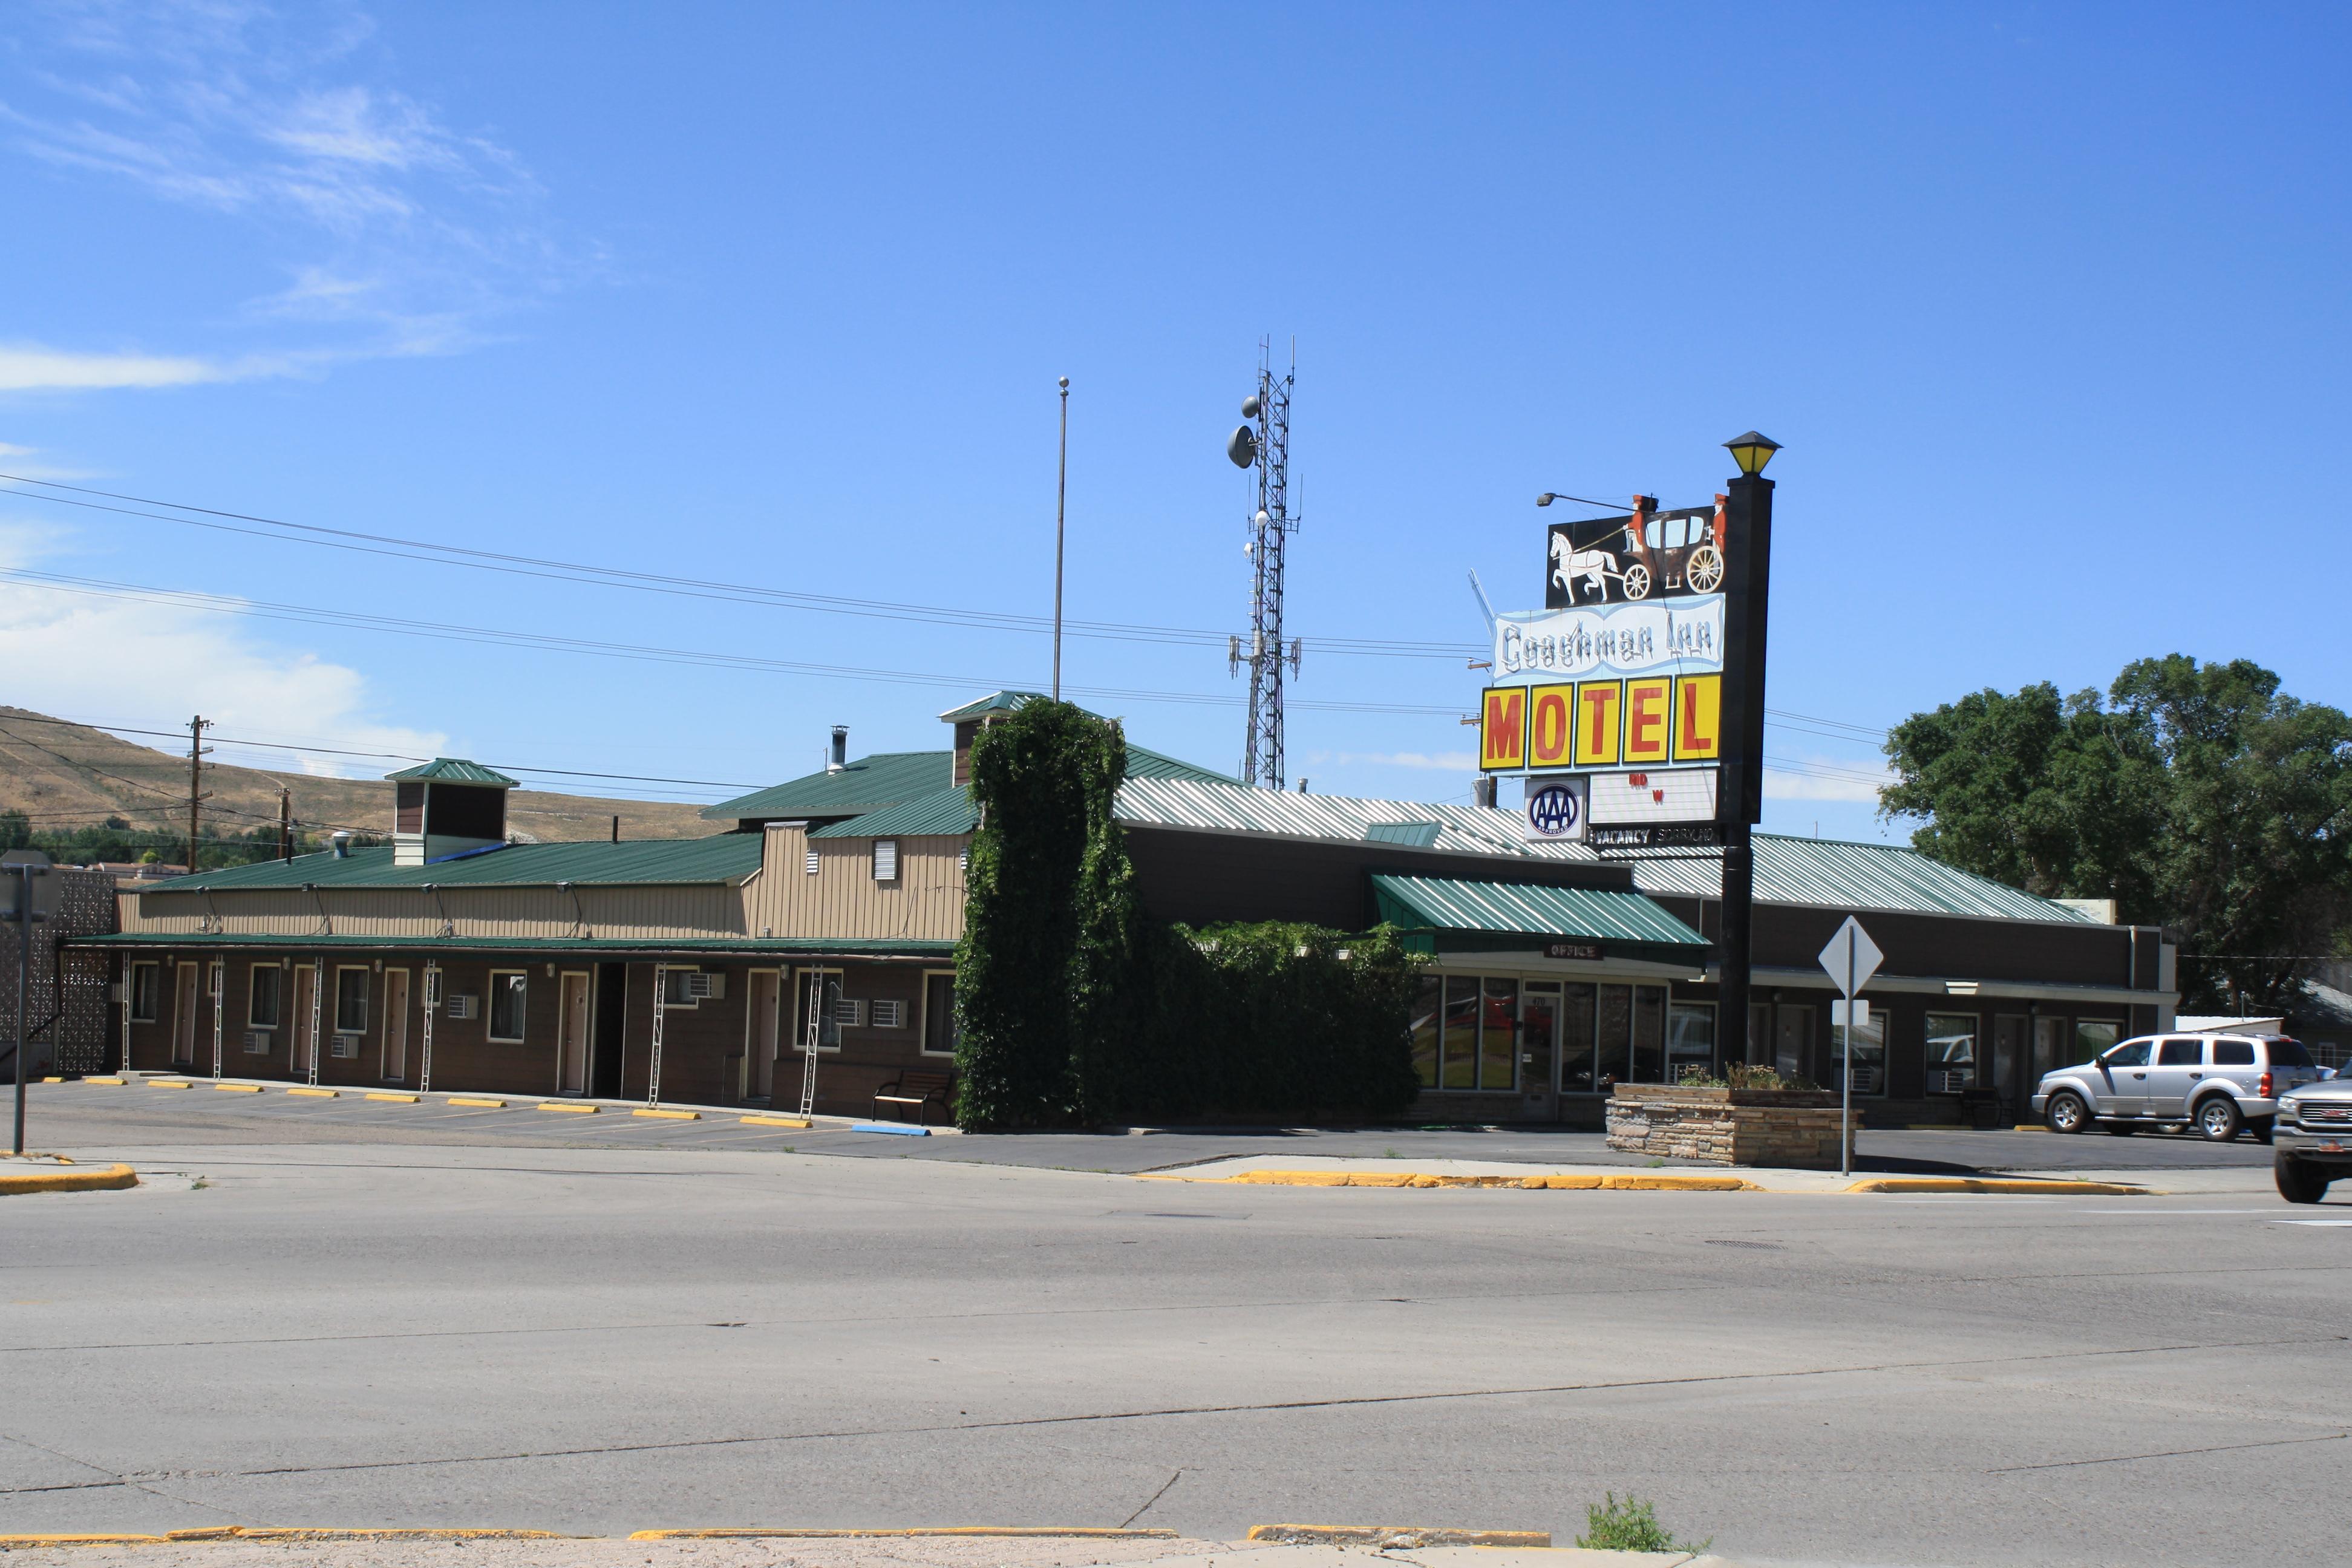 Coachman Inn Motel, Green River WY